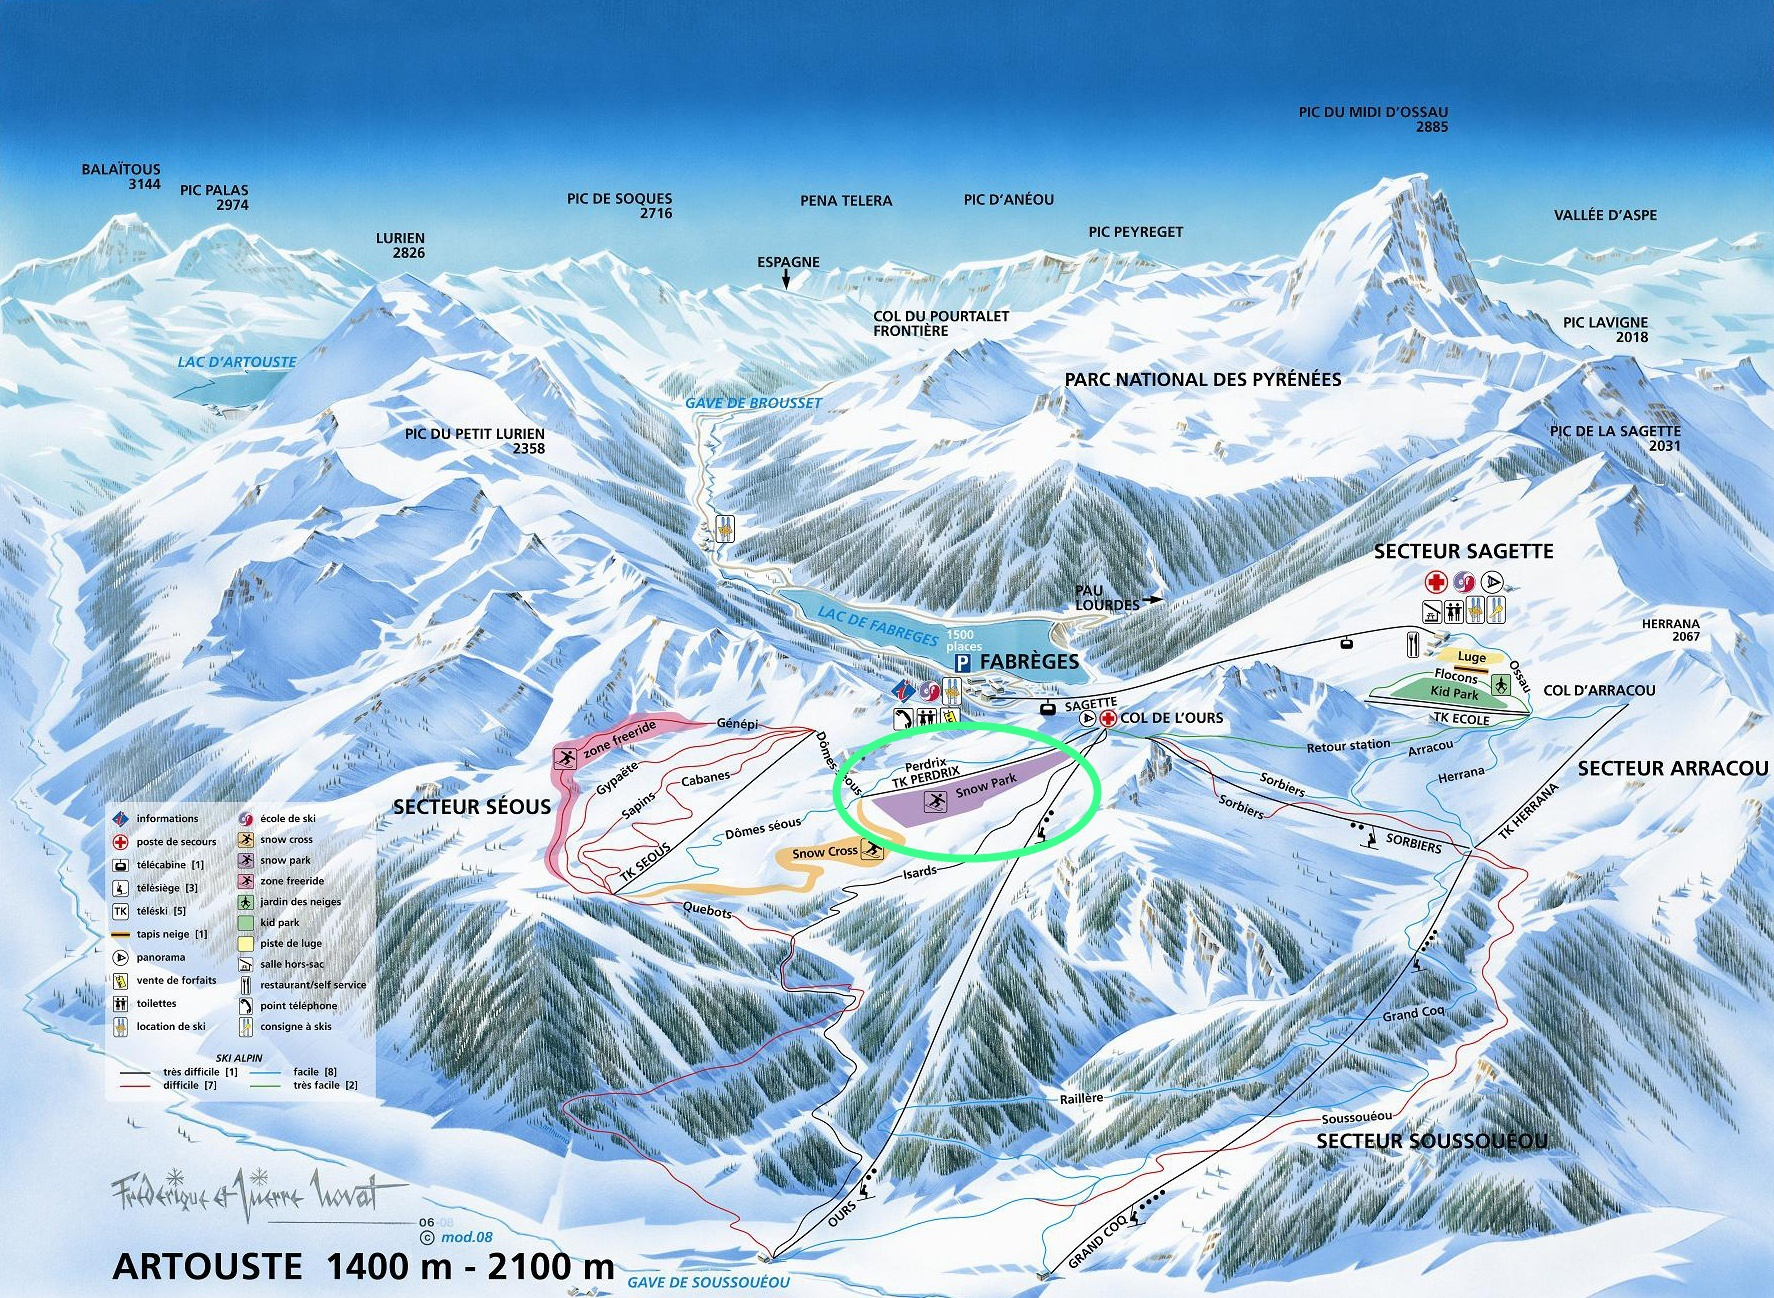 Artouste Piste / Trail Map